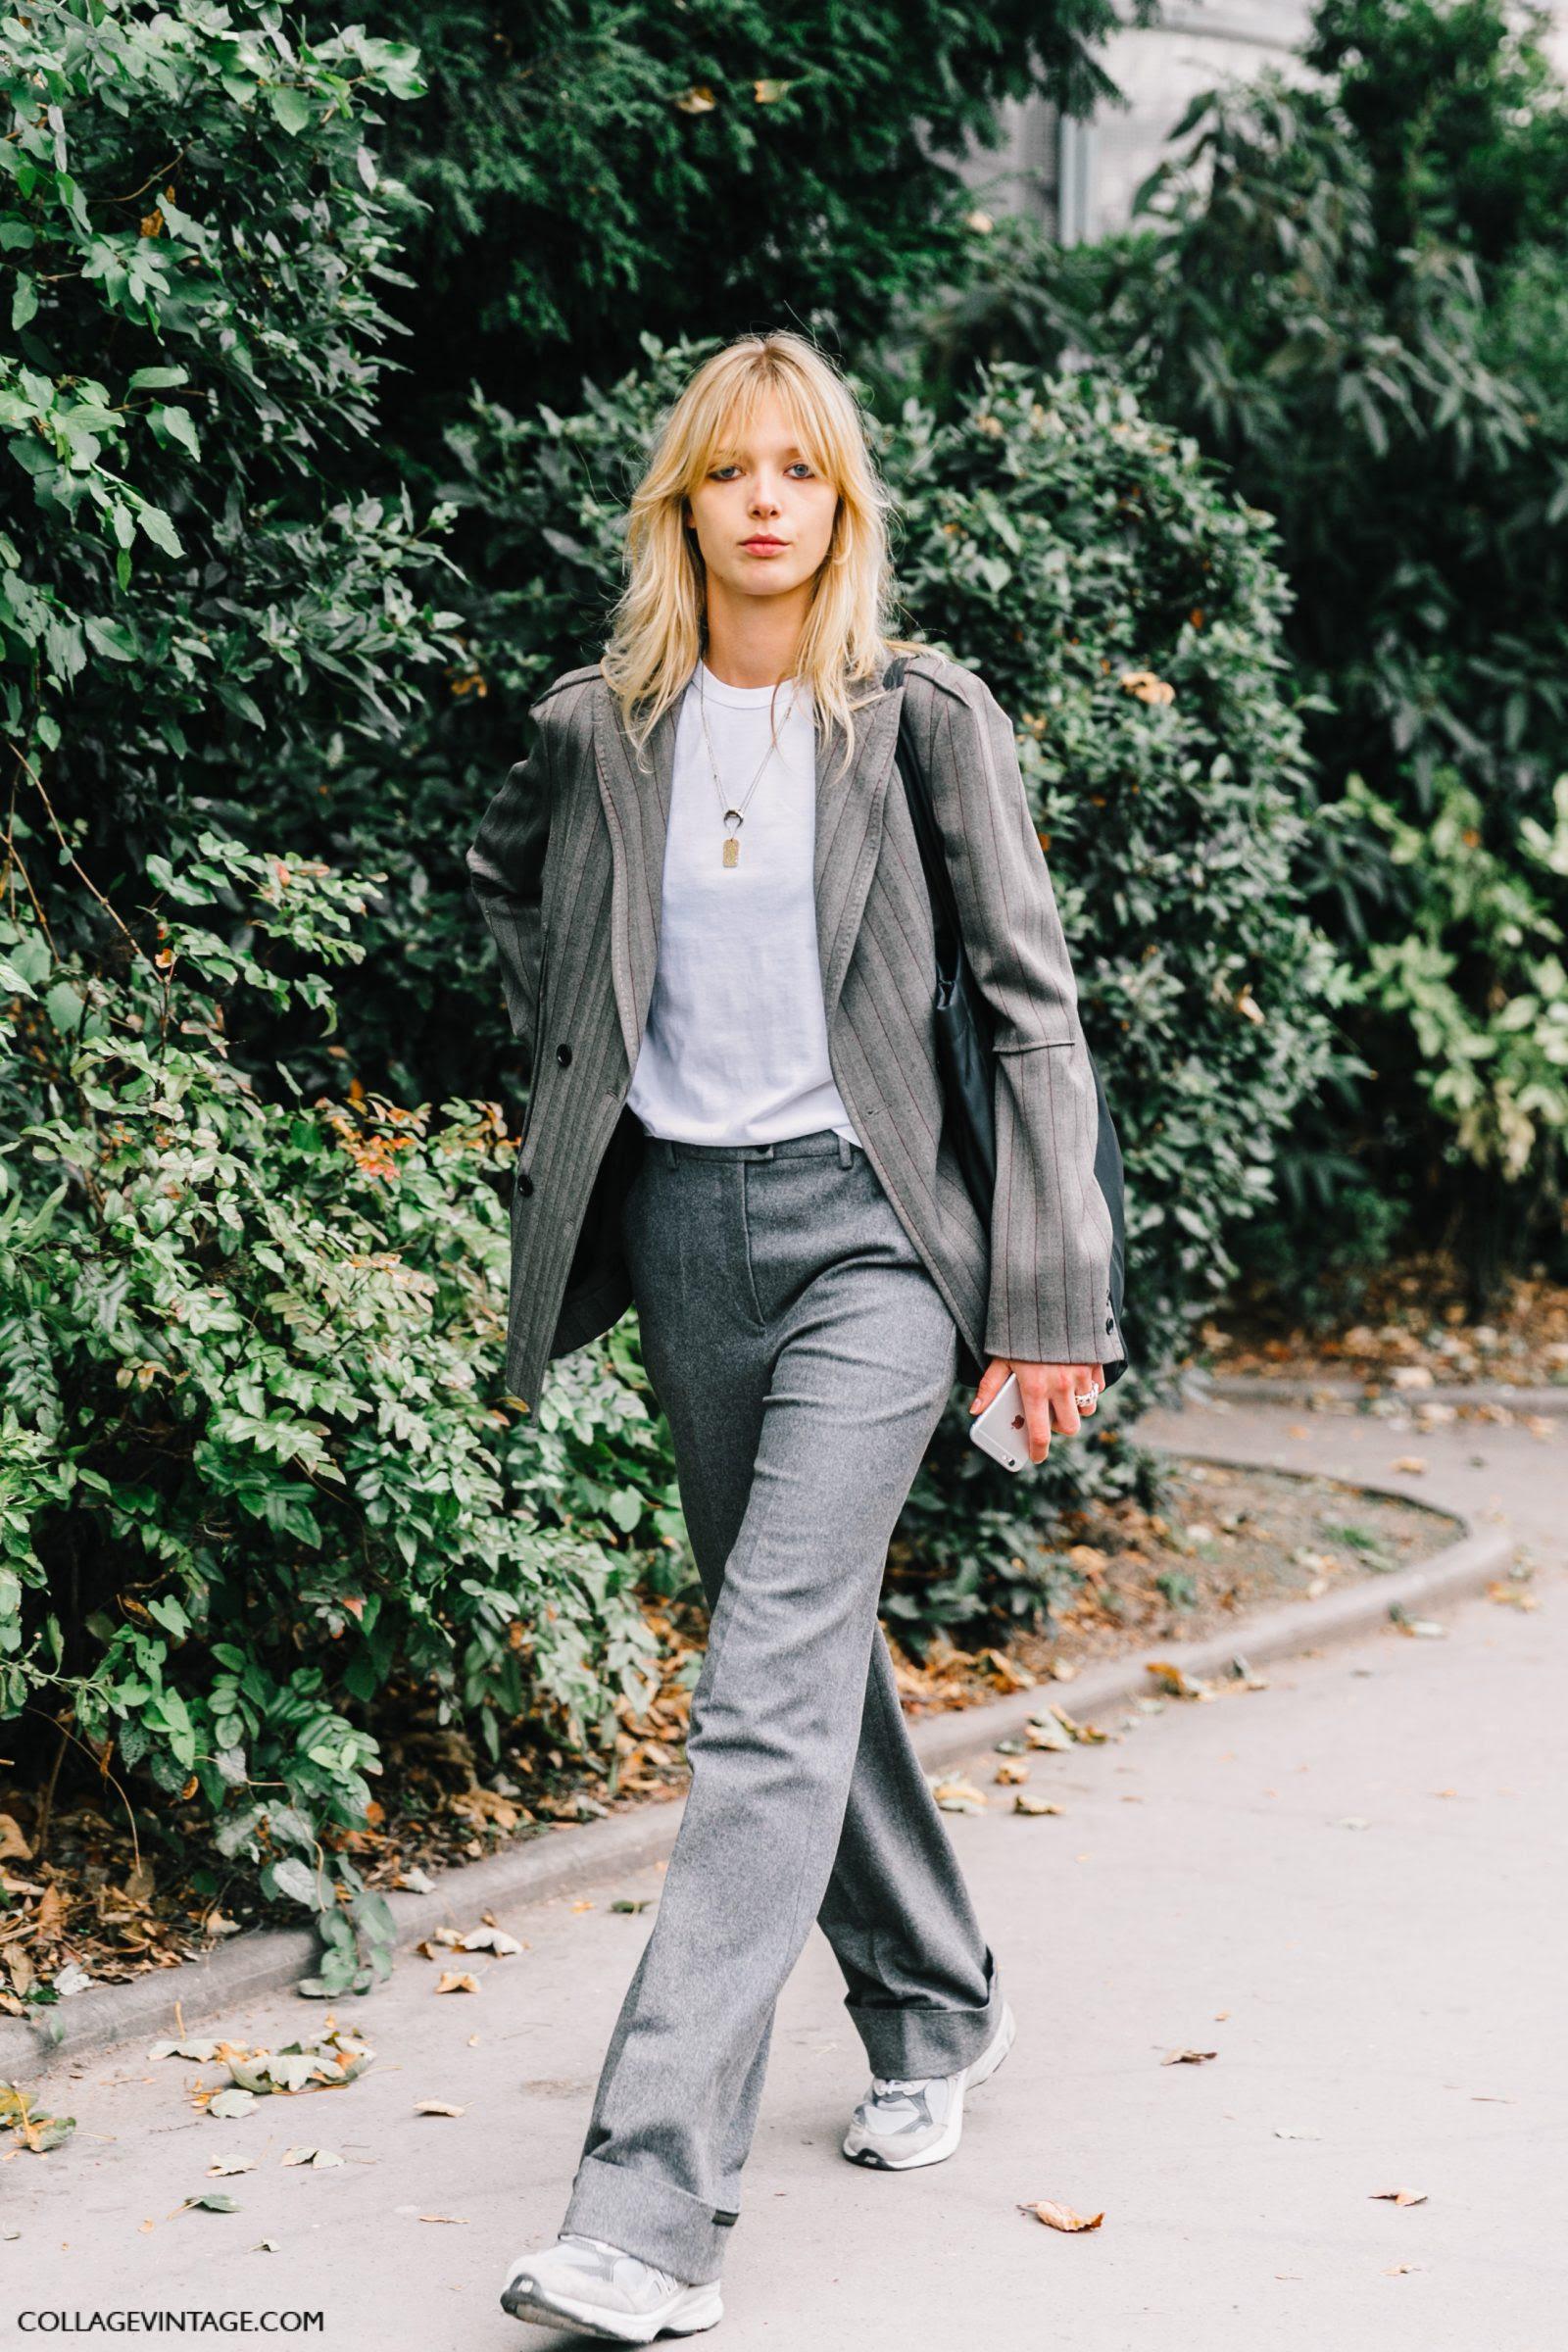 pfw-paris_fashion_week_ss17-street_style-outfits-collage_vintage-chloe-carven-balmain-barbara_bui-67